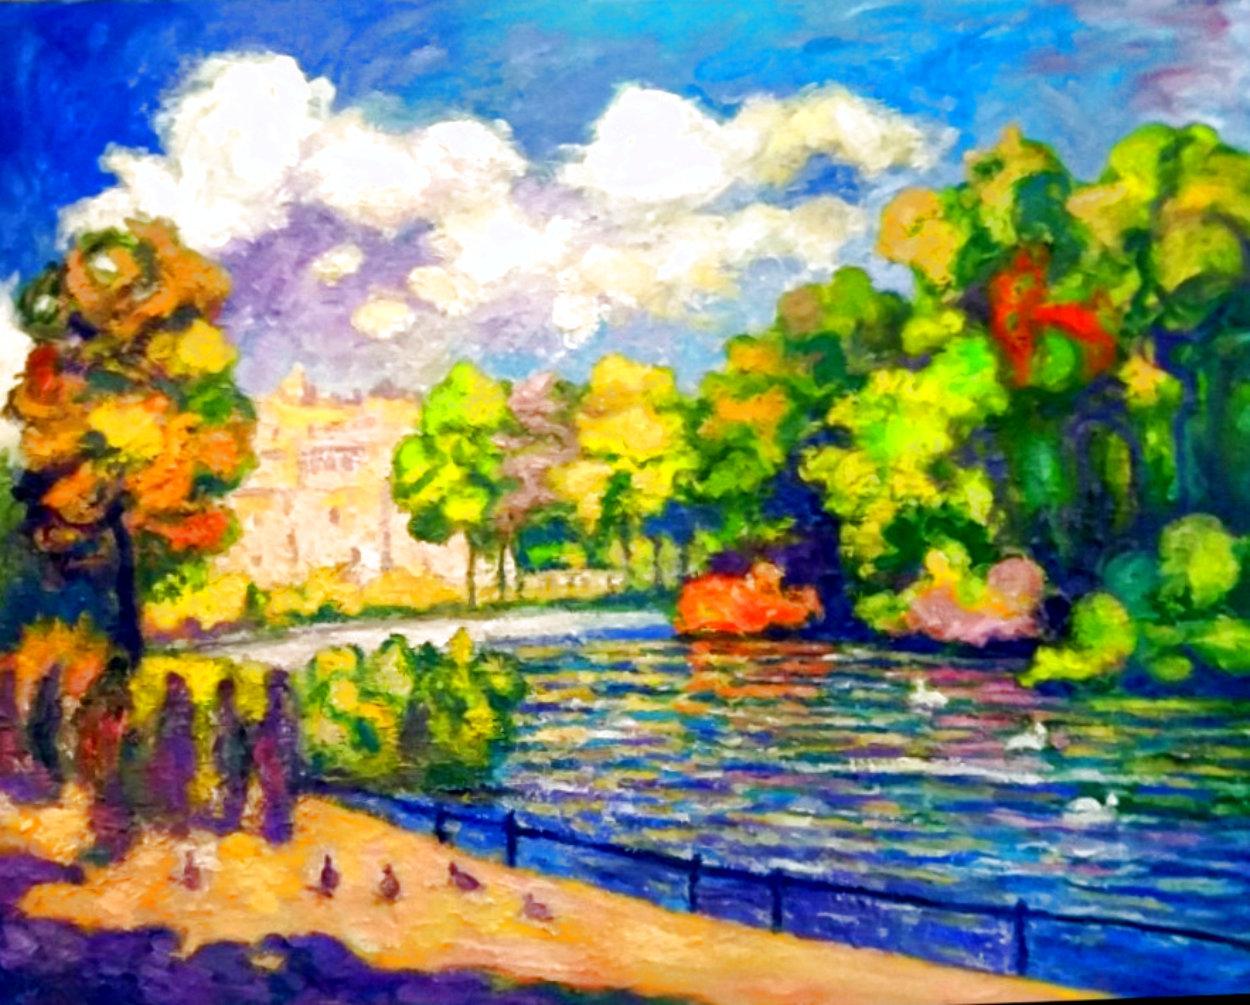 St. James Park Summer Scene 2019 50x40  Super Huge Original Painting by Memli Zhuri